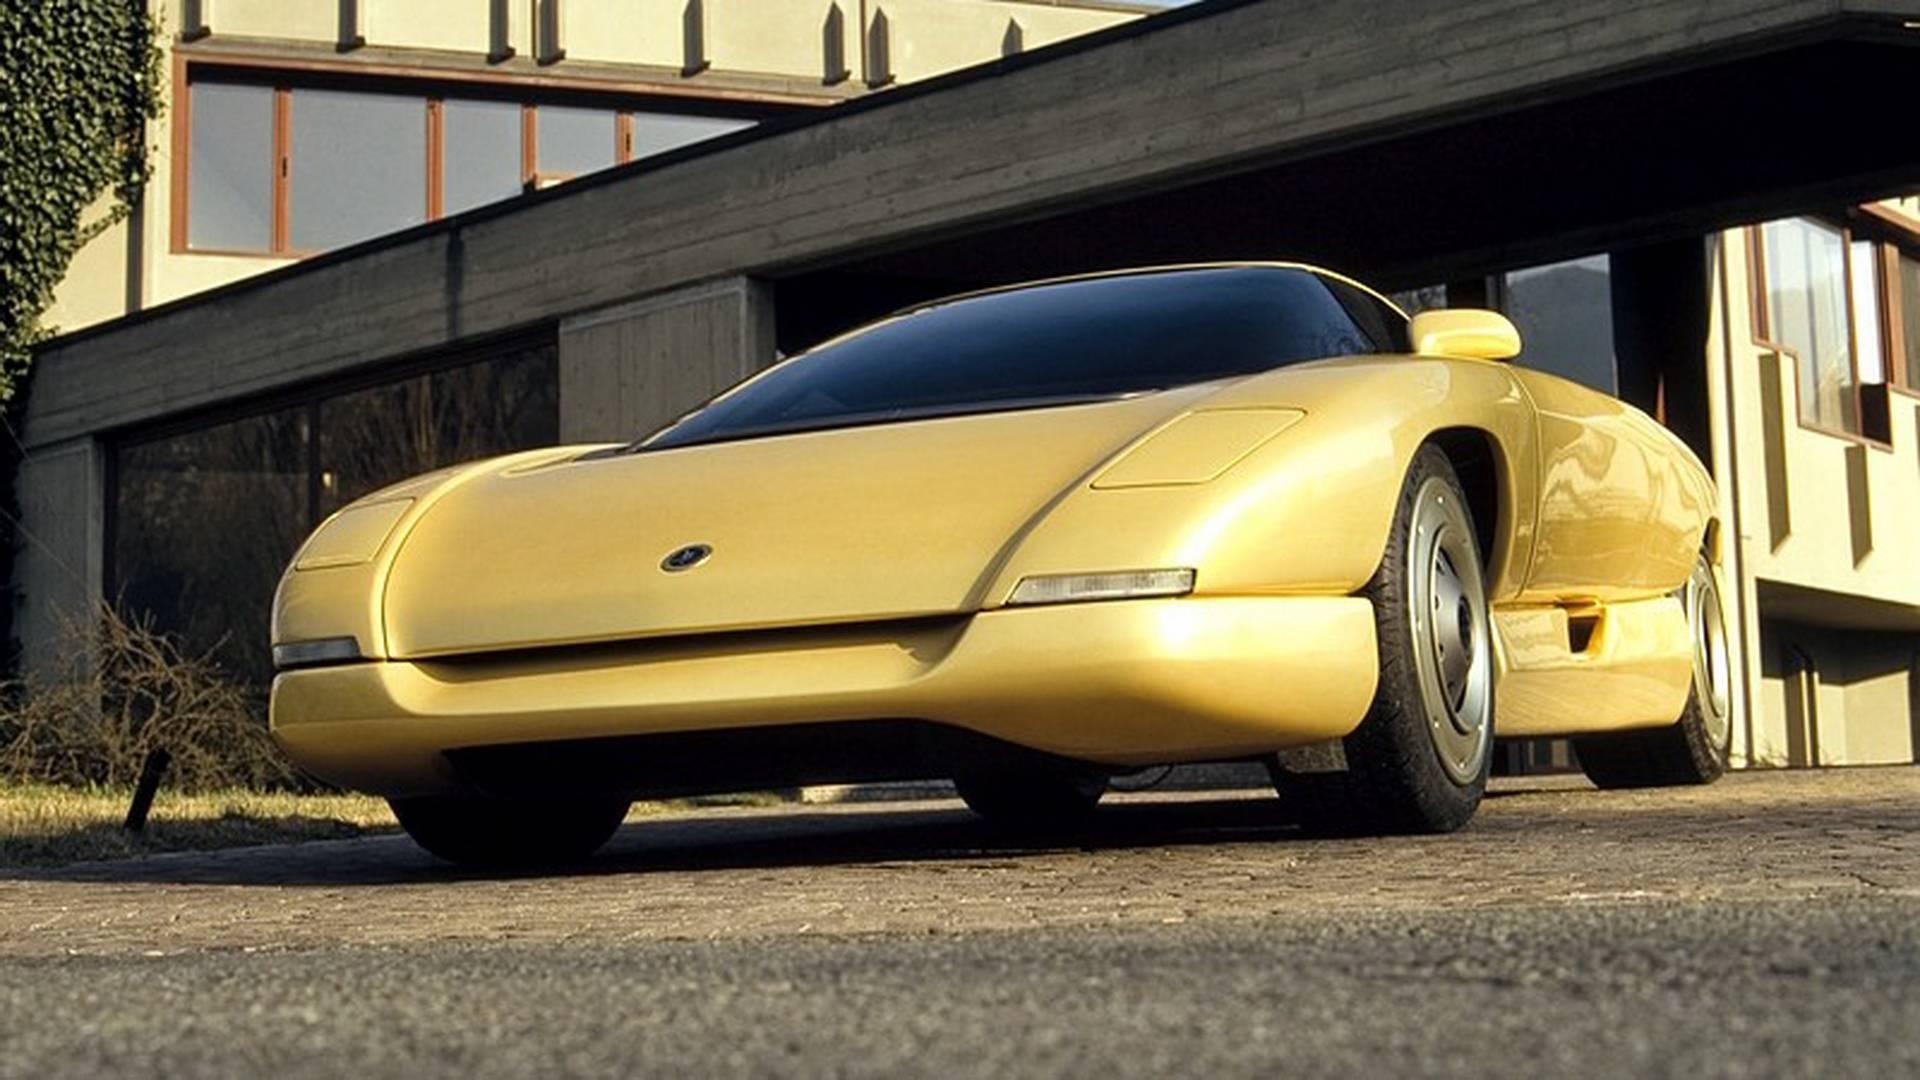 1990 Bertone Nivola concept low front end